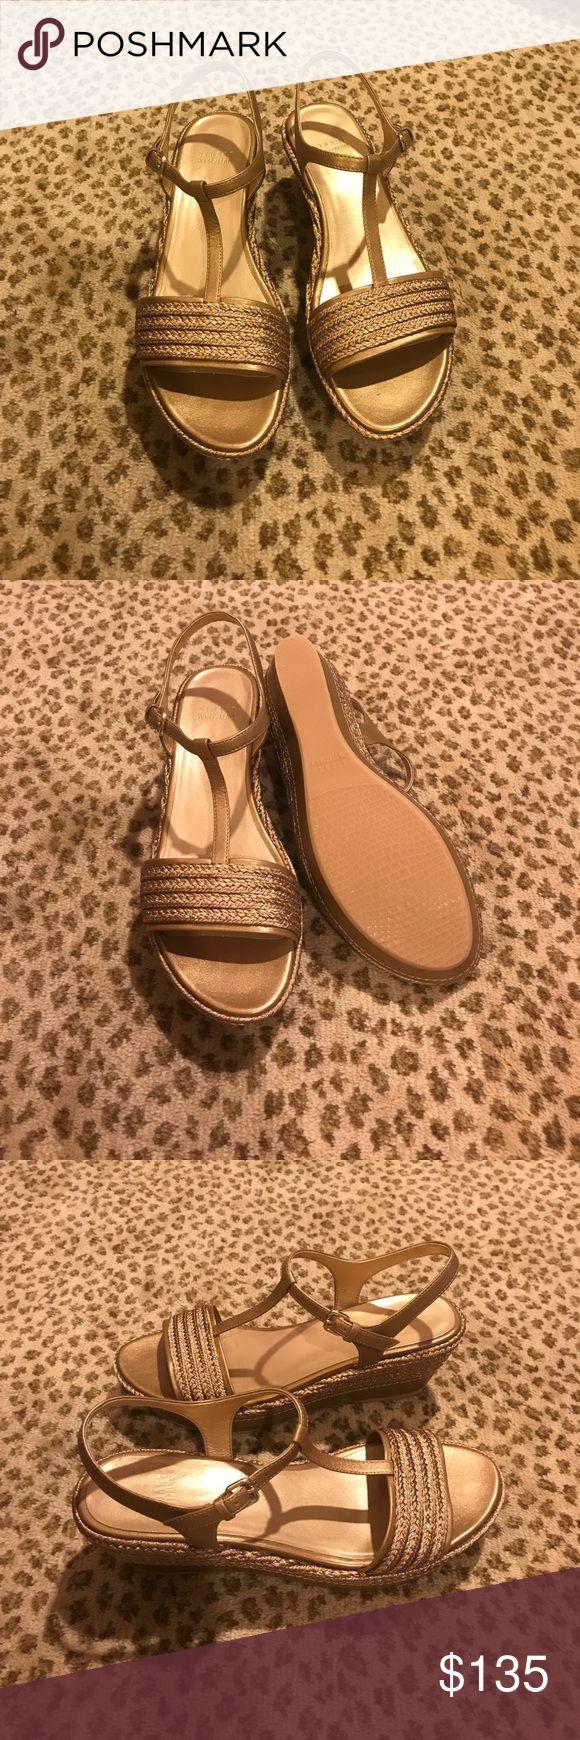 NWOT Stuart Weitzman gold espadrille sandals NWOT Stuart Weitzman gold espadrille sandals. Never worn. Stuart Weitzman Shoes Sandals